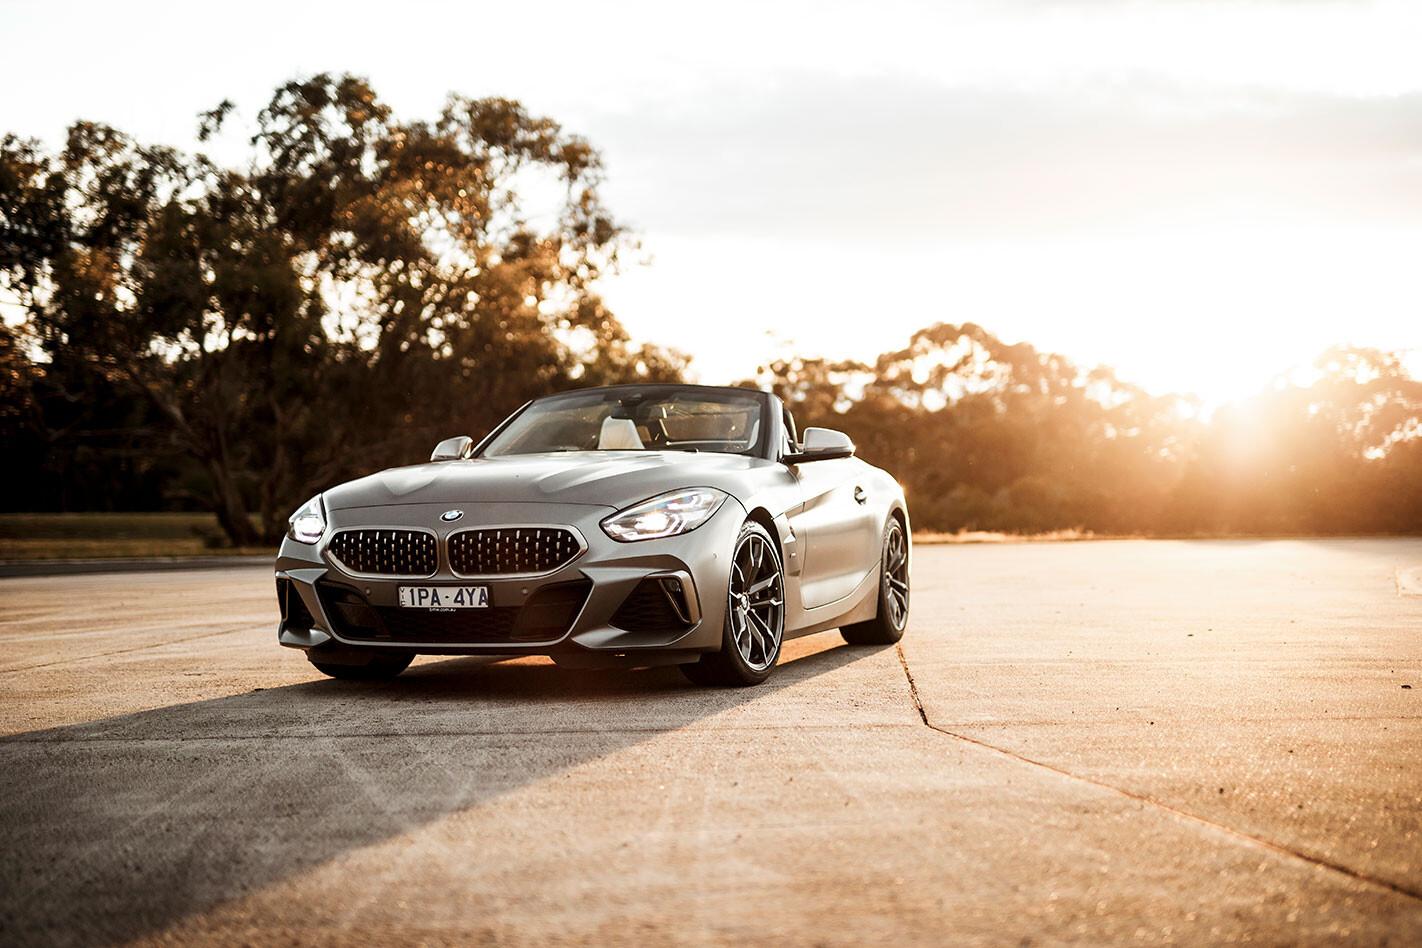 BMW Z4 - 2020 COTY Contender